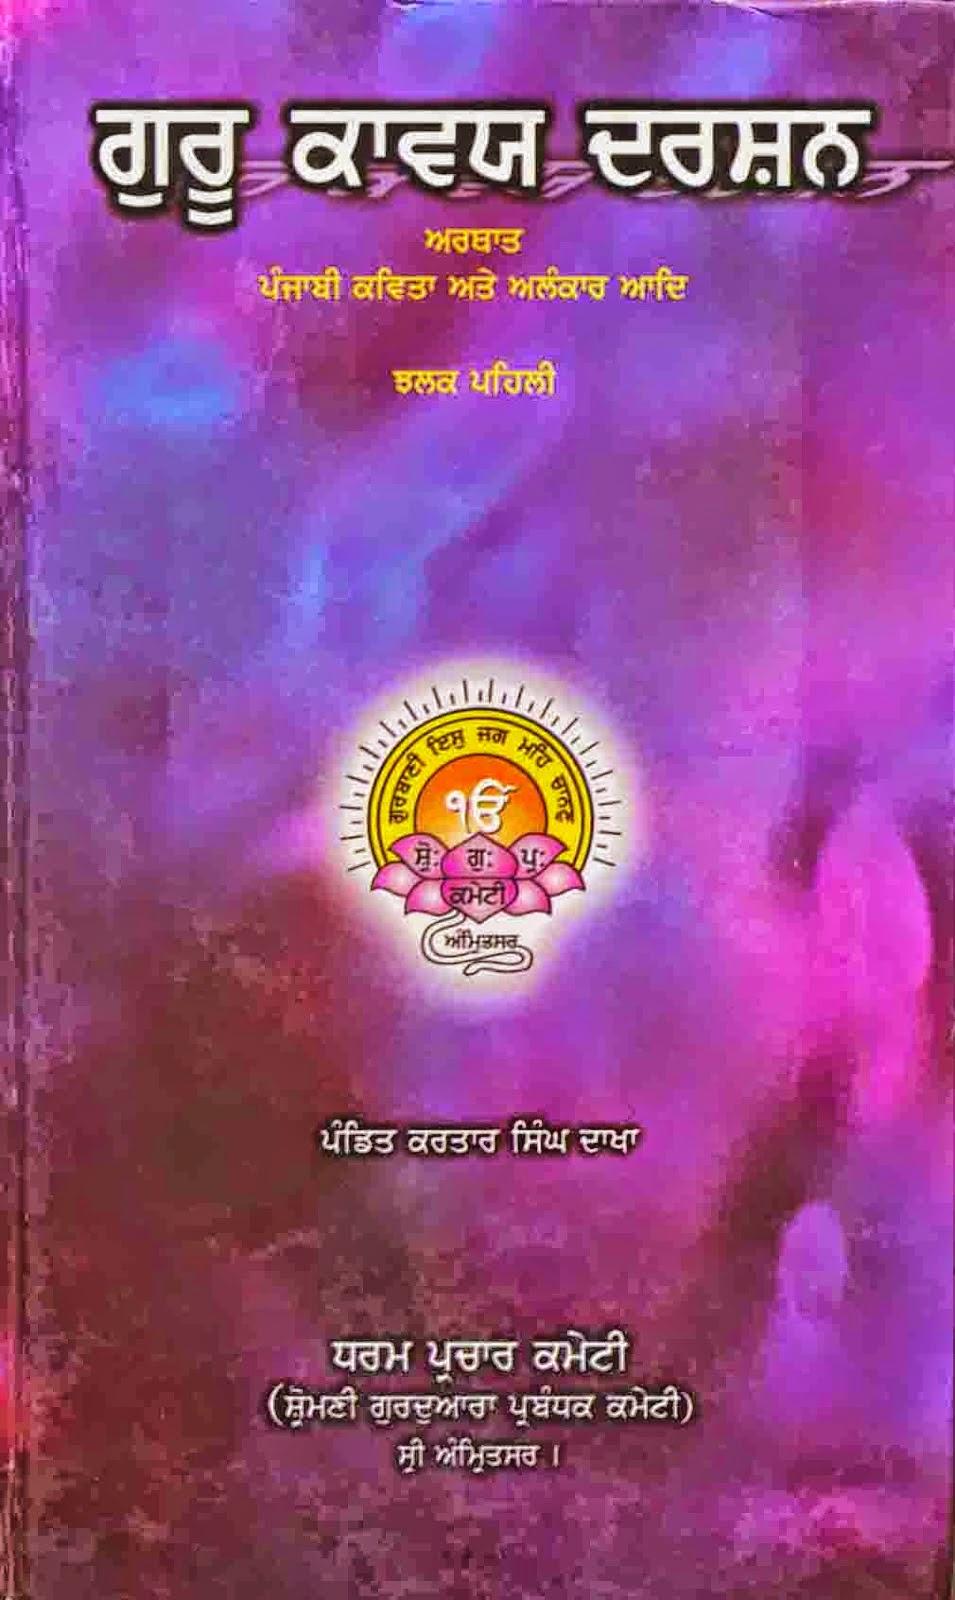 http://sikhdigitallibrary.blogspot.com/2016/02/guru-kavya-darshan-arthat-punjabi.html